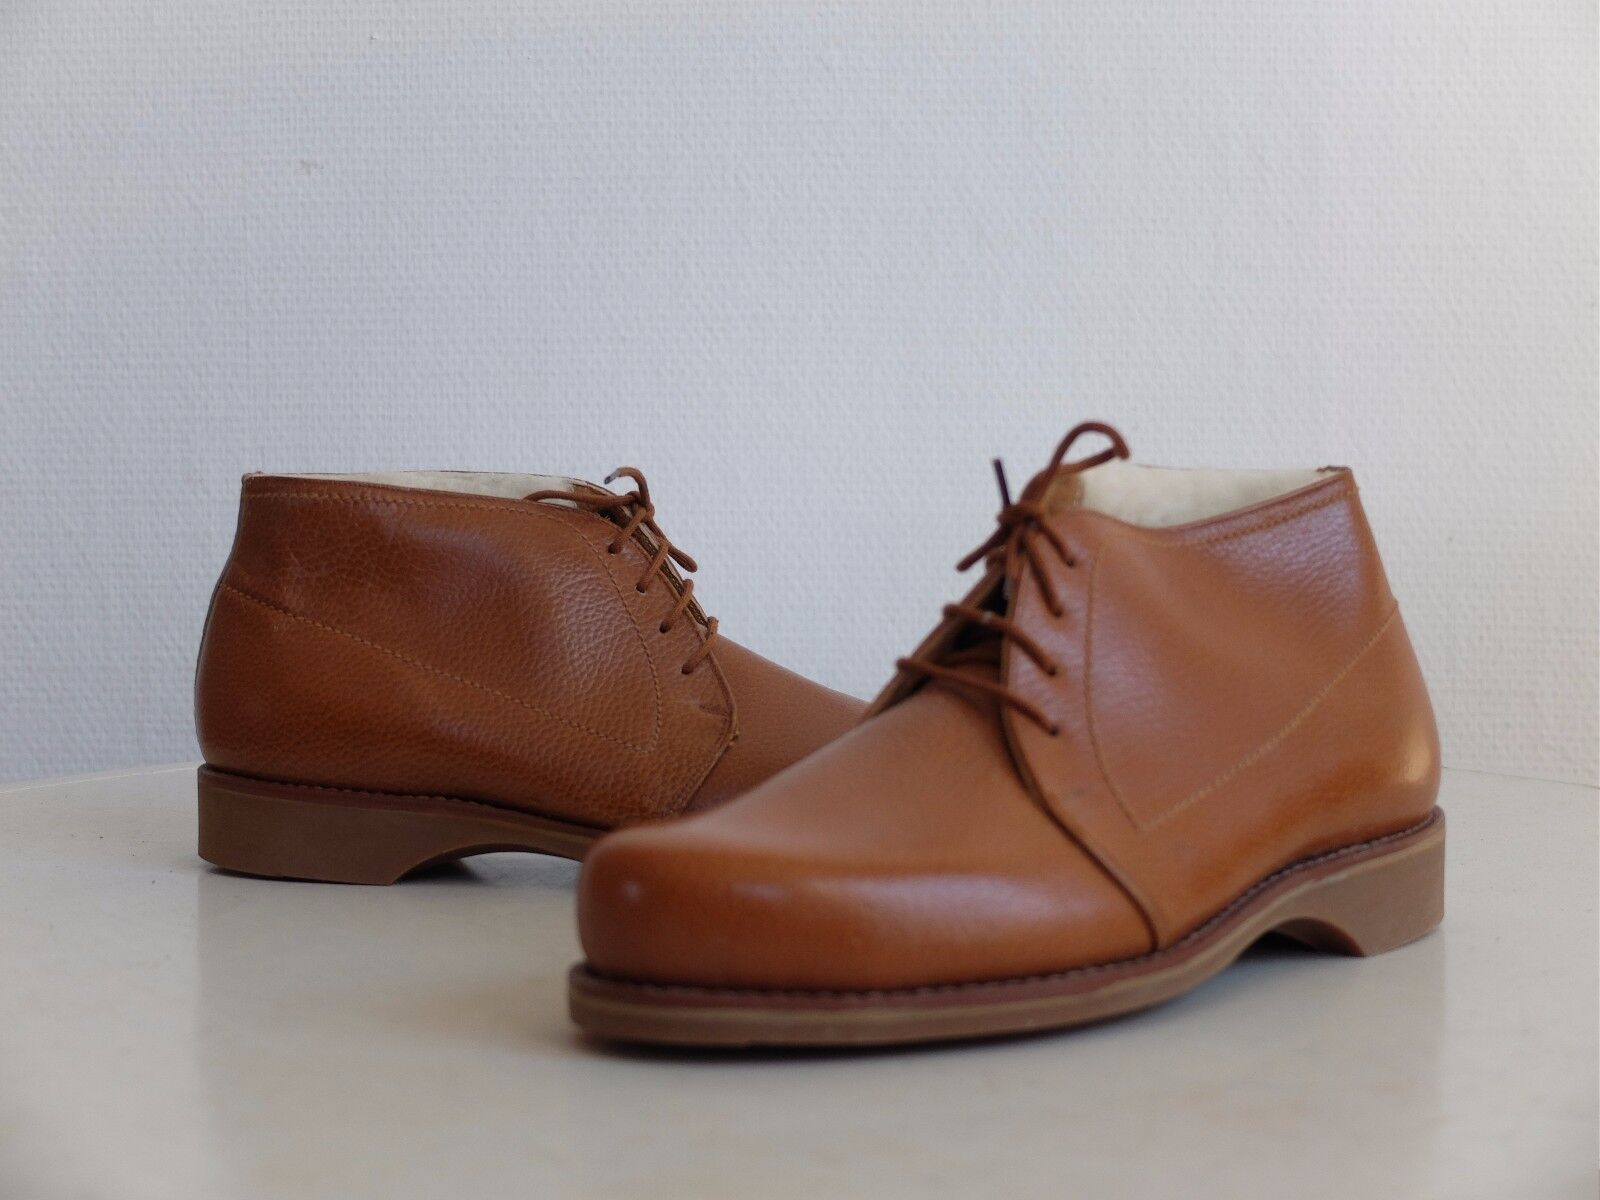 CONTINENTAL Damen WinterSchuhe Stiefel Leder Schuhe Damenschuhe True Vintage NOS